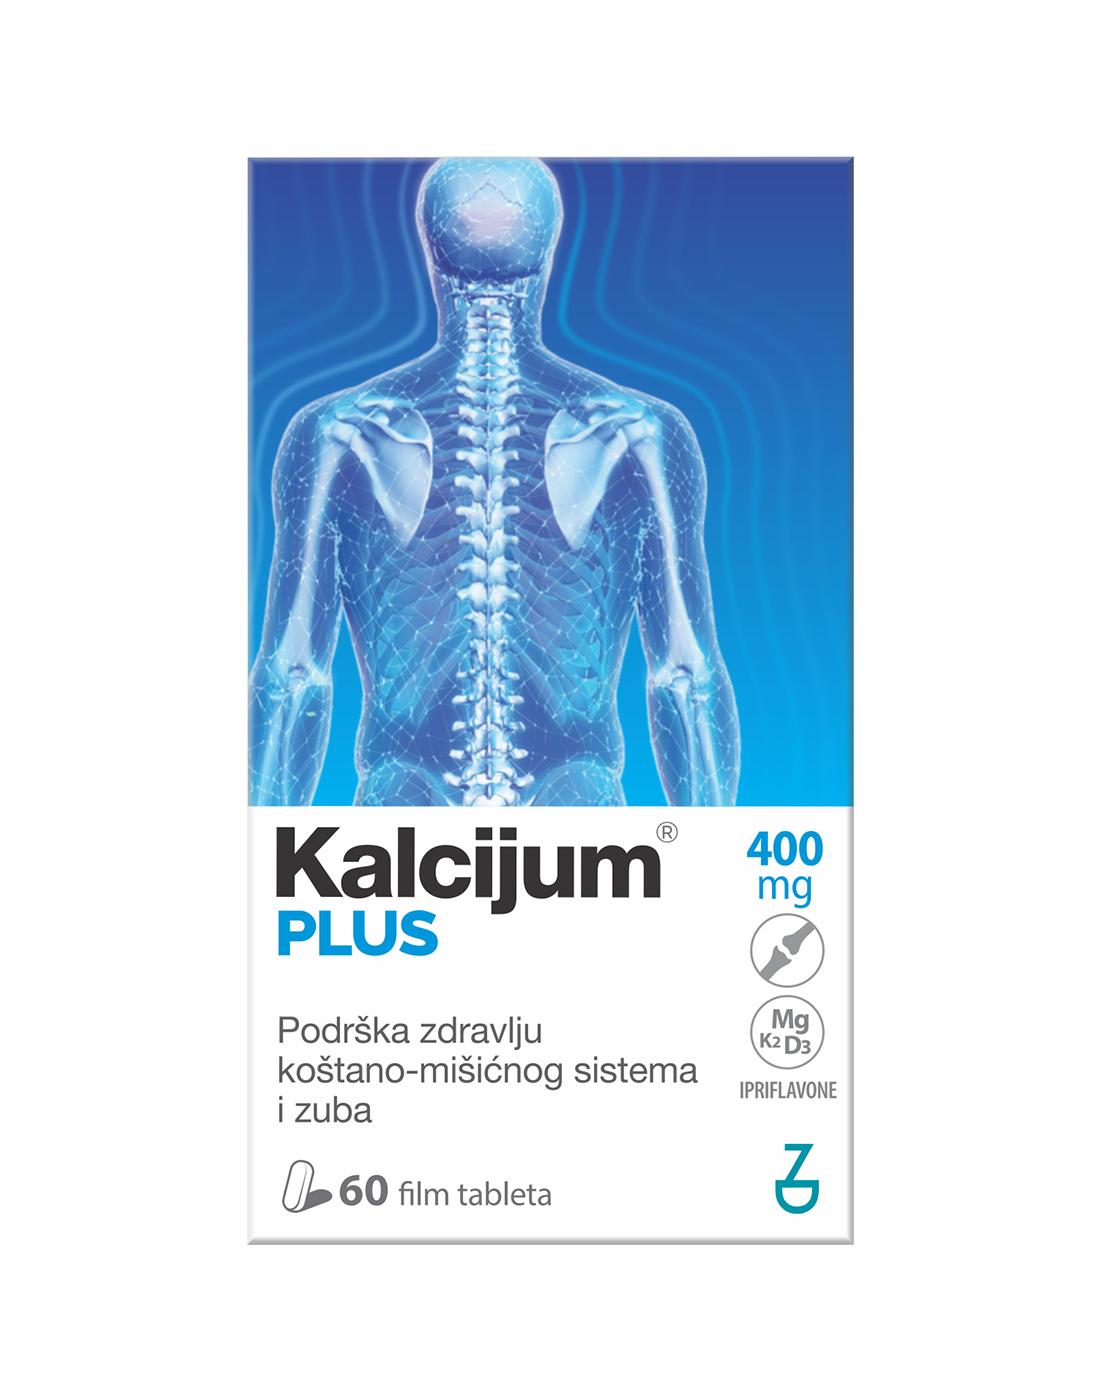 Kalcijum plus